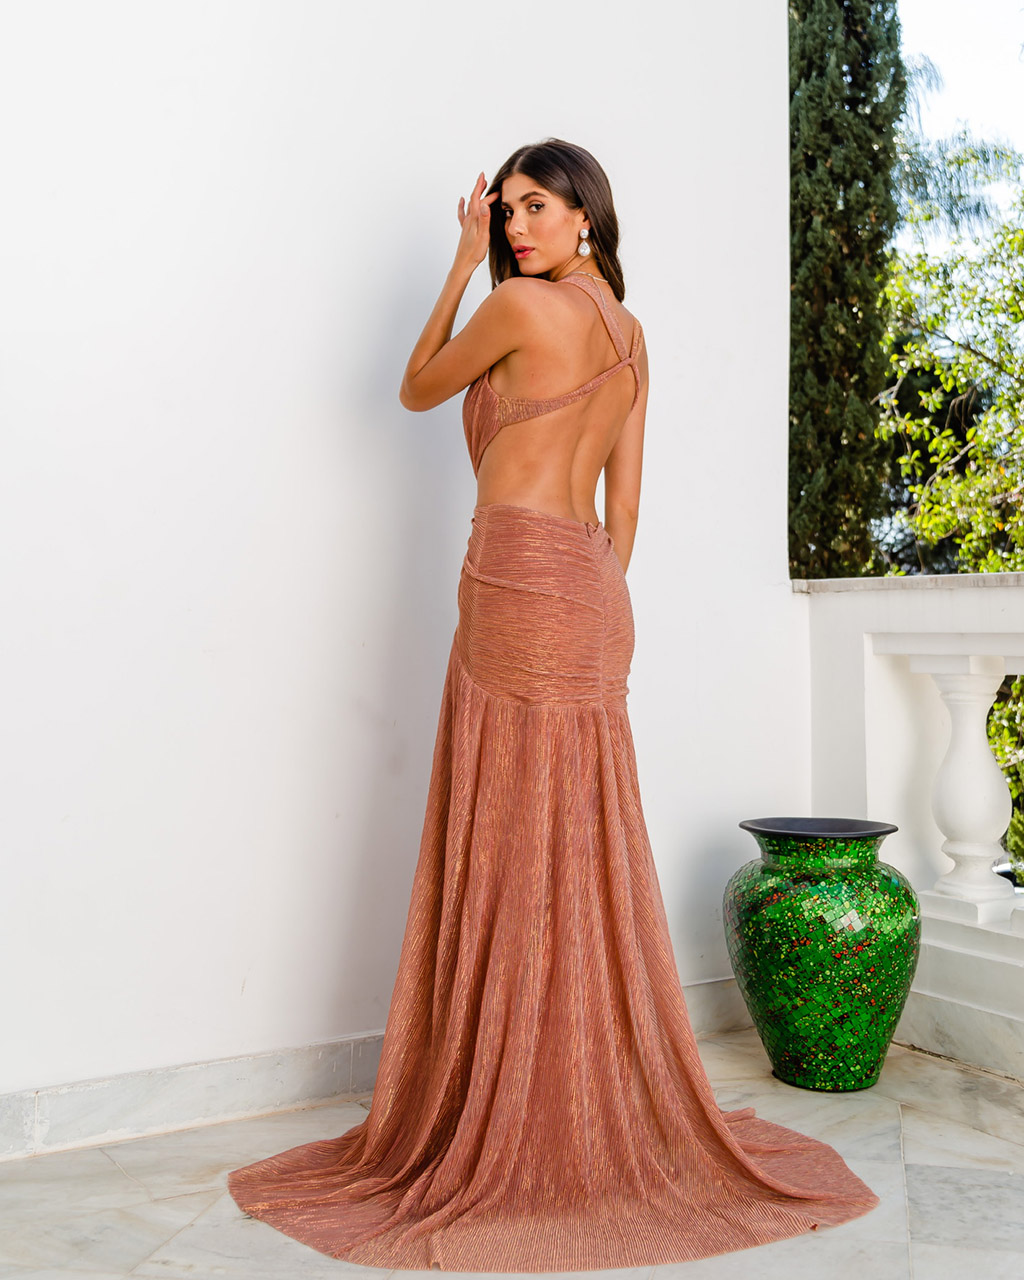 Vestido Denise  - Empório NM